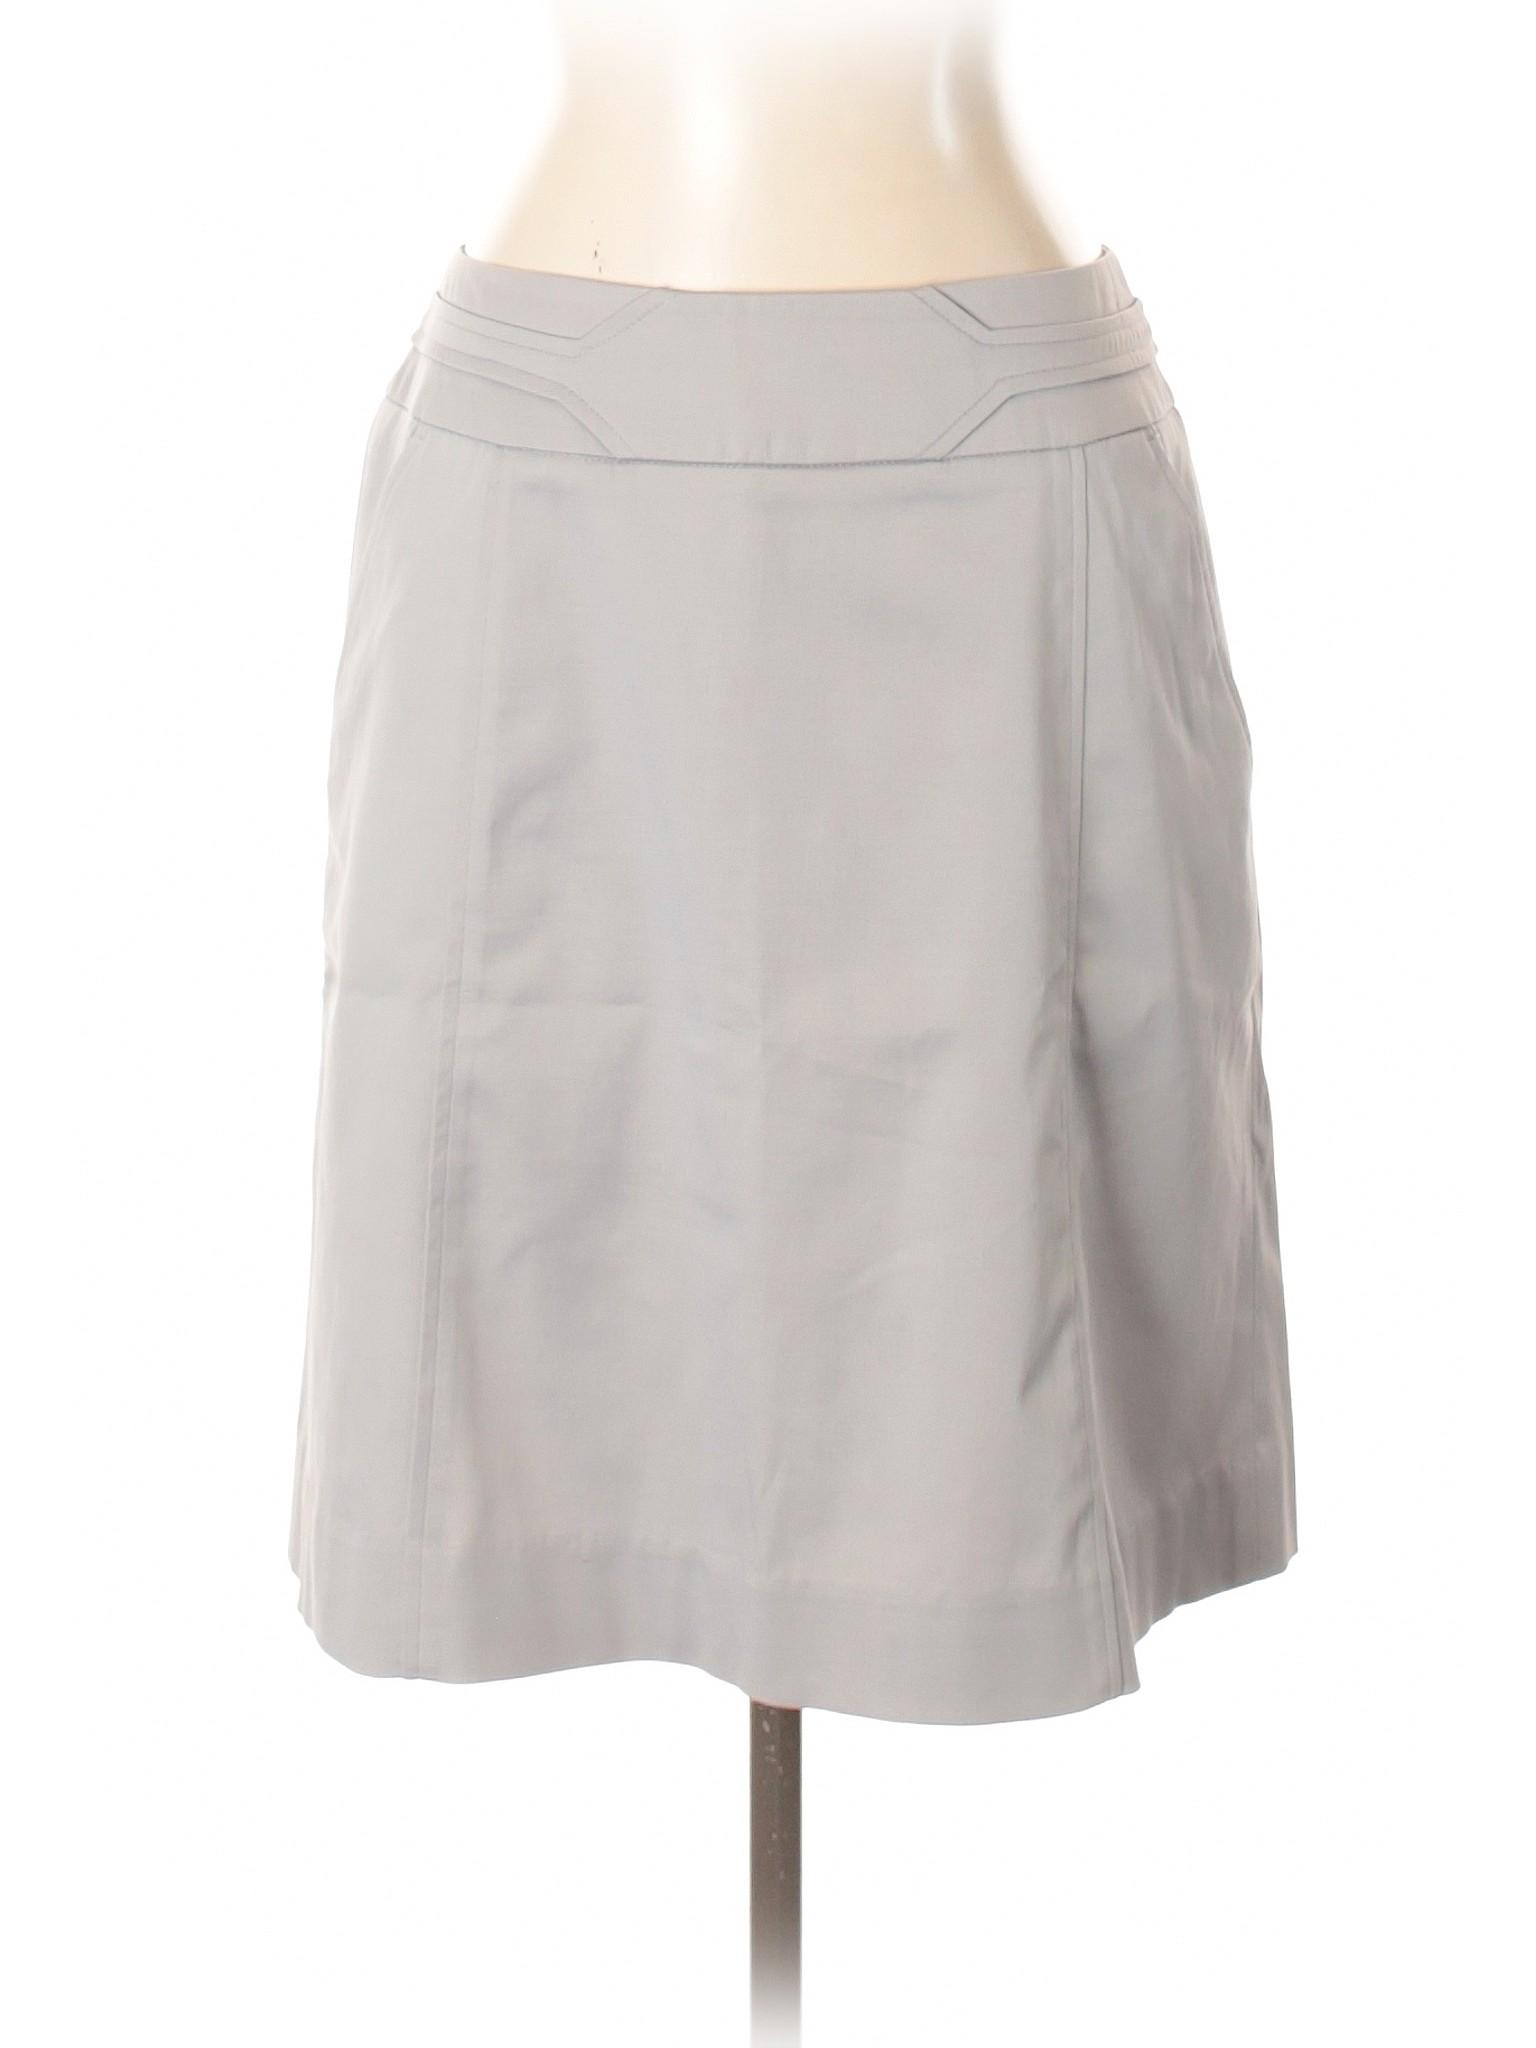 Casual Skirt Skirt Skirt Skirt Boutique Boutique Casual Casual Boutique Boutique Casual HREwYq